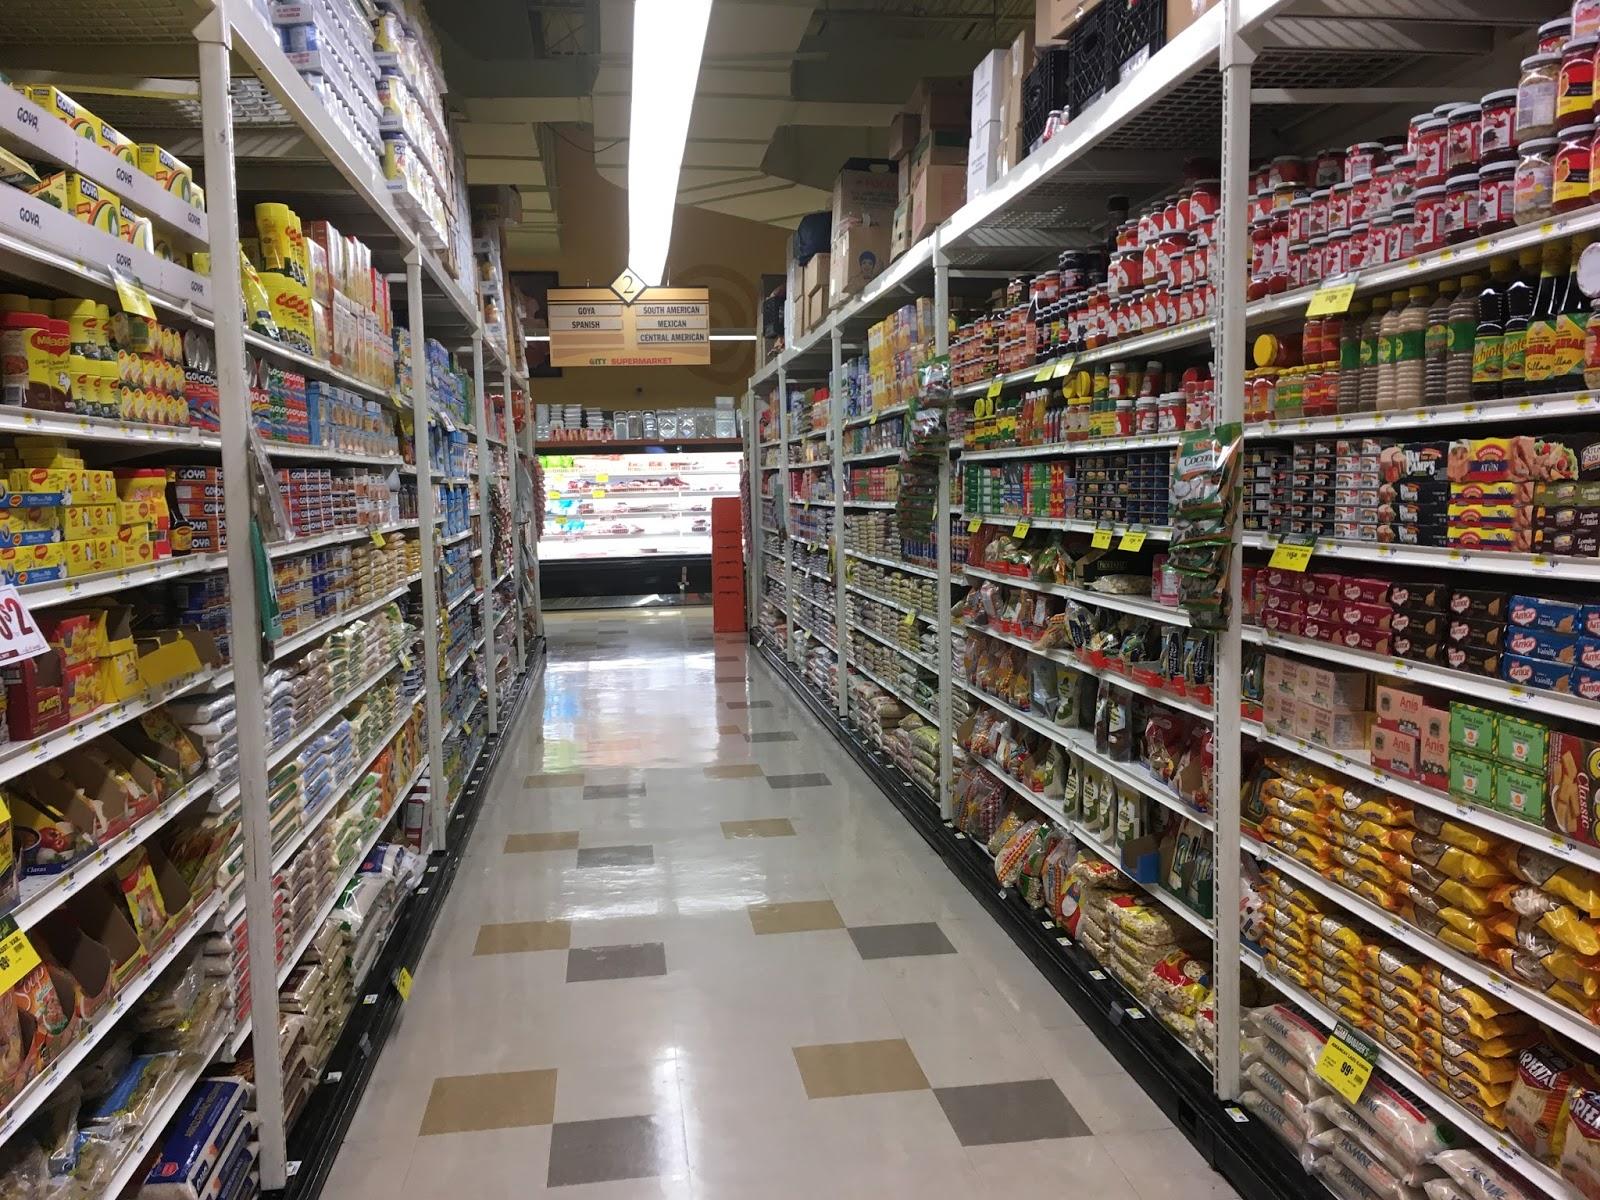 The Market Report: TOUR: City Supermarket - Newark, NJ